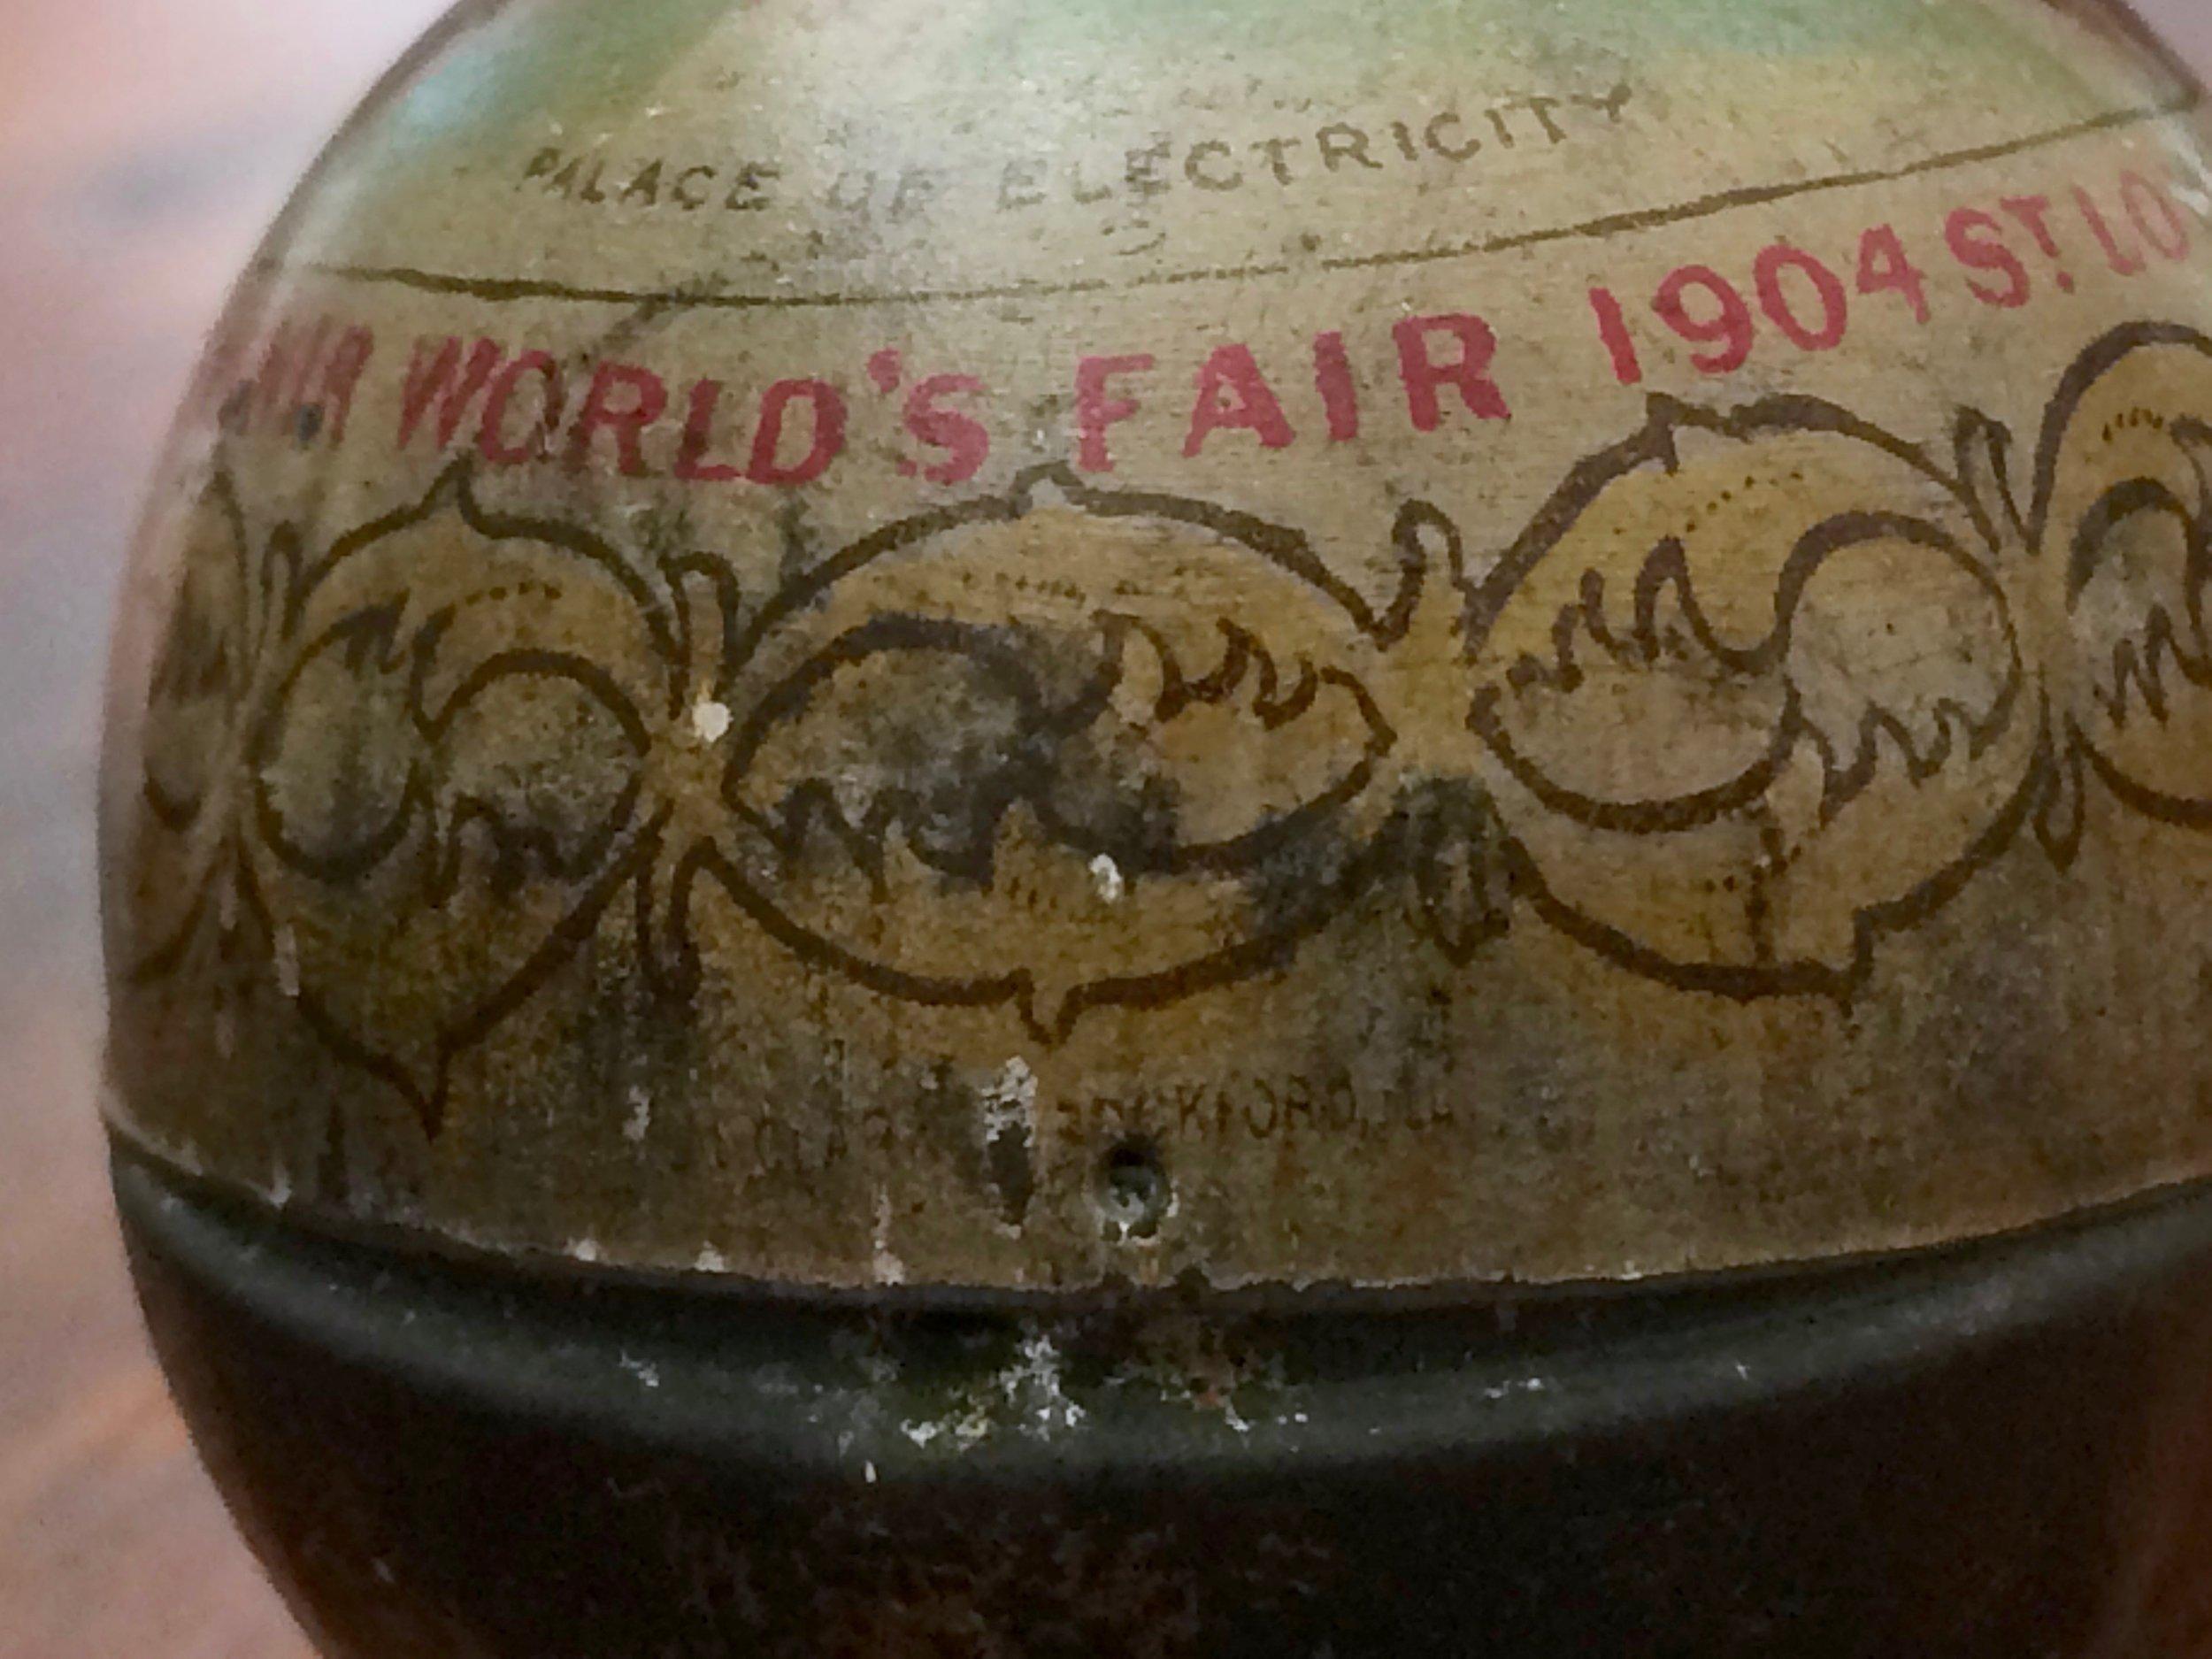 World's Fair Souvenir Egg 1904